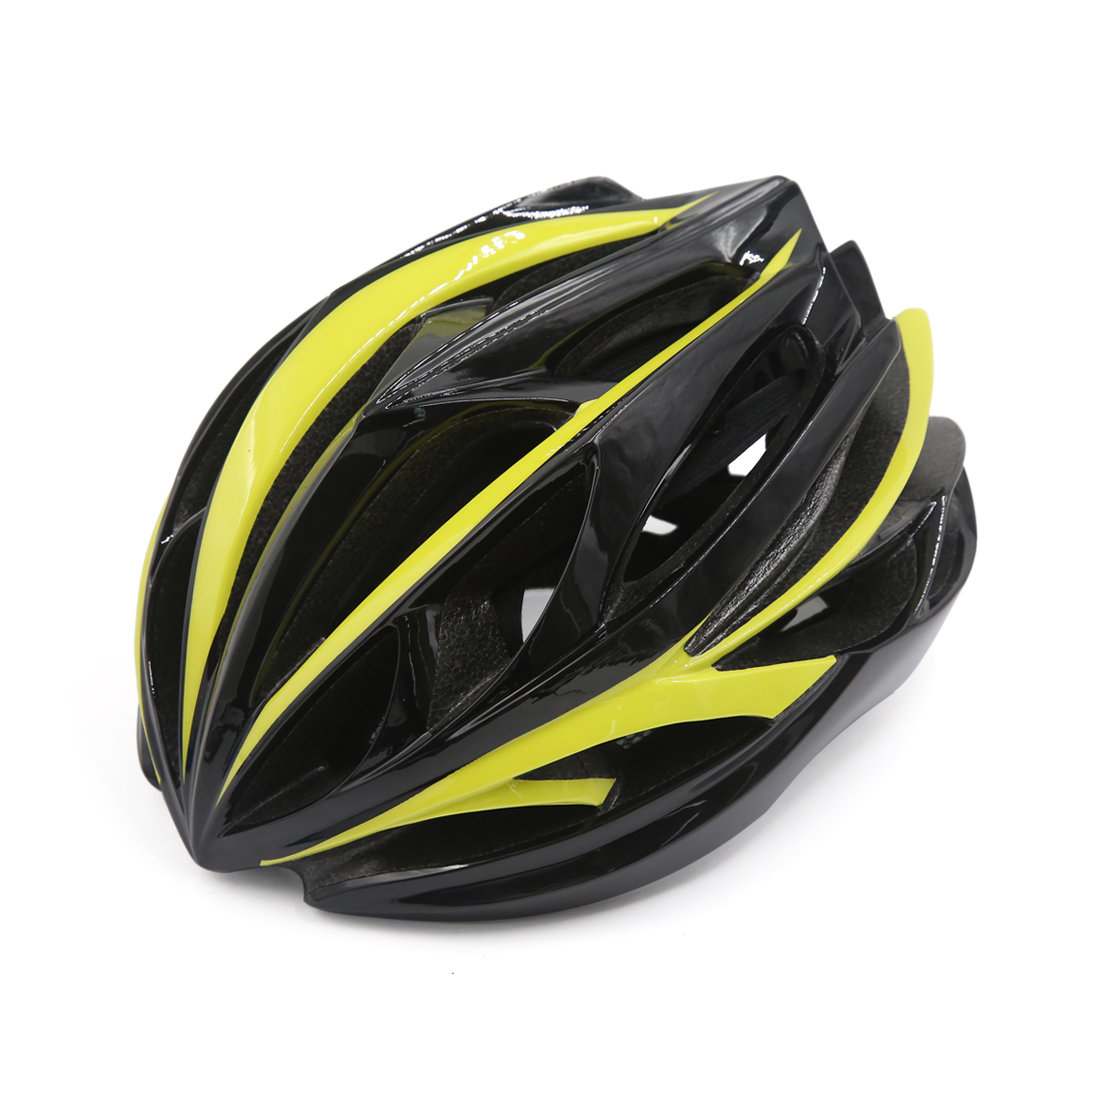 Unisex Adult MTB Mountain Bike Bicycle Cycling Shockproof Helmet Black Yellow